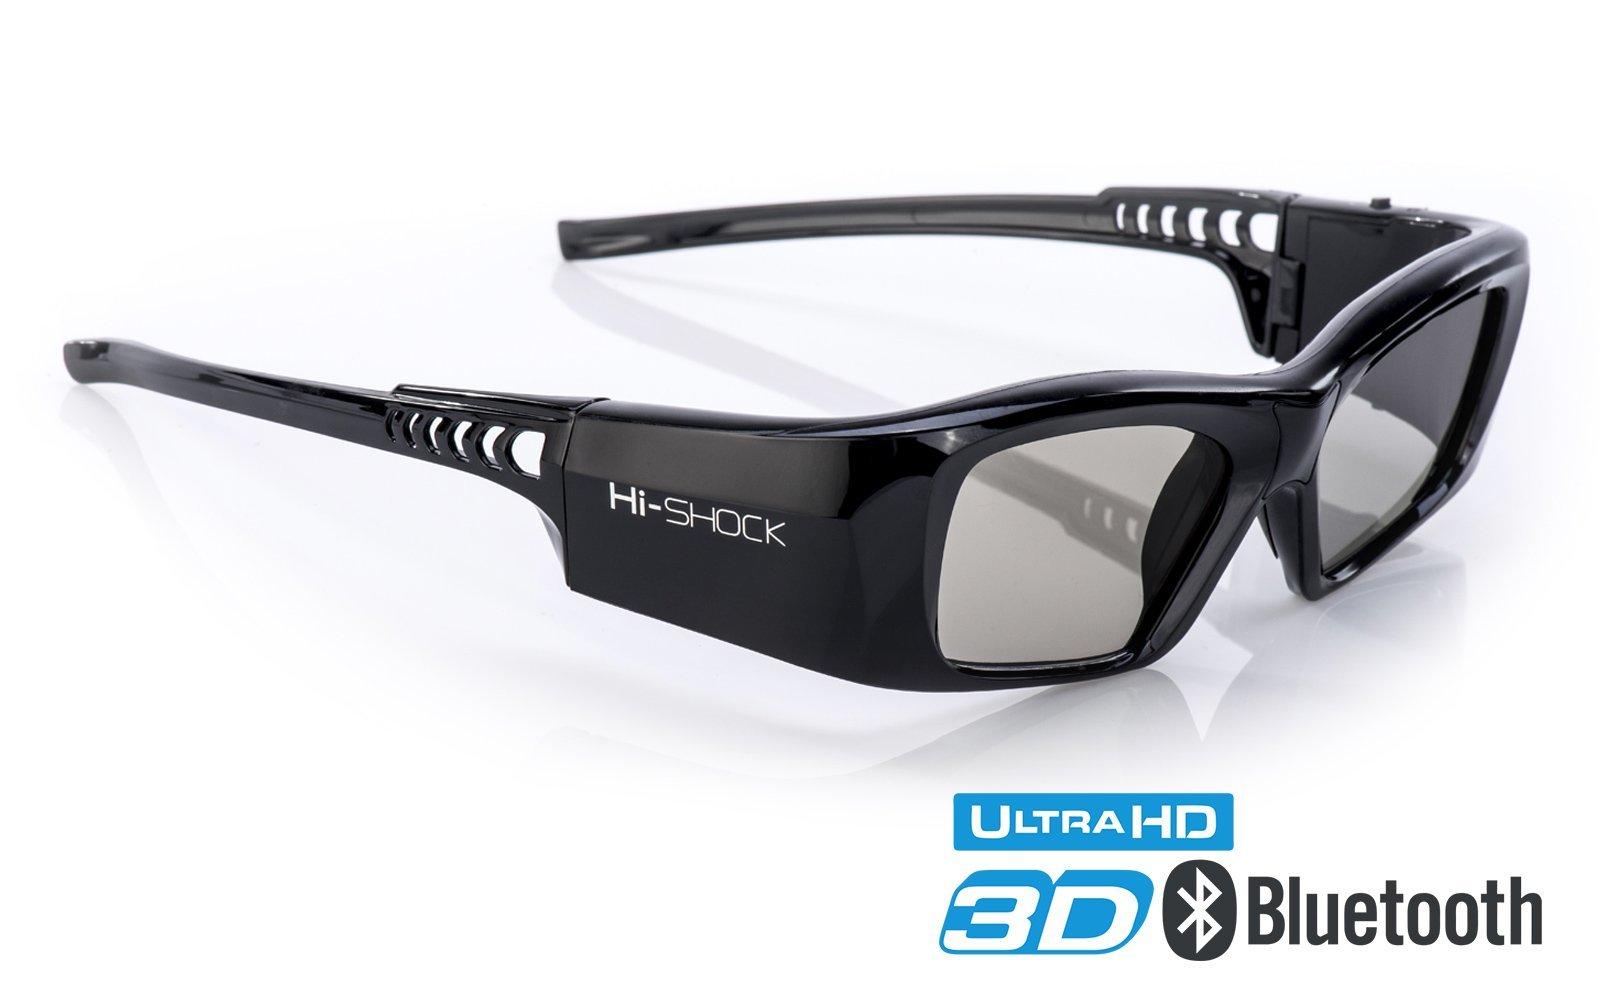 Samsung-Compatible Hi-SHOCK 3D active Glasses | Rechargeable | For 2013-2018 SAMSUNG, SHARP, LG Plasma, PANASONIC, Sony Full HD/HDR/4k TV |''Black Diamond''